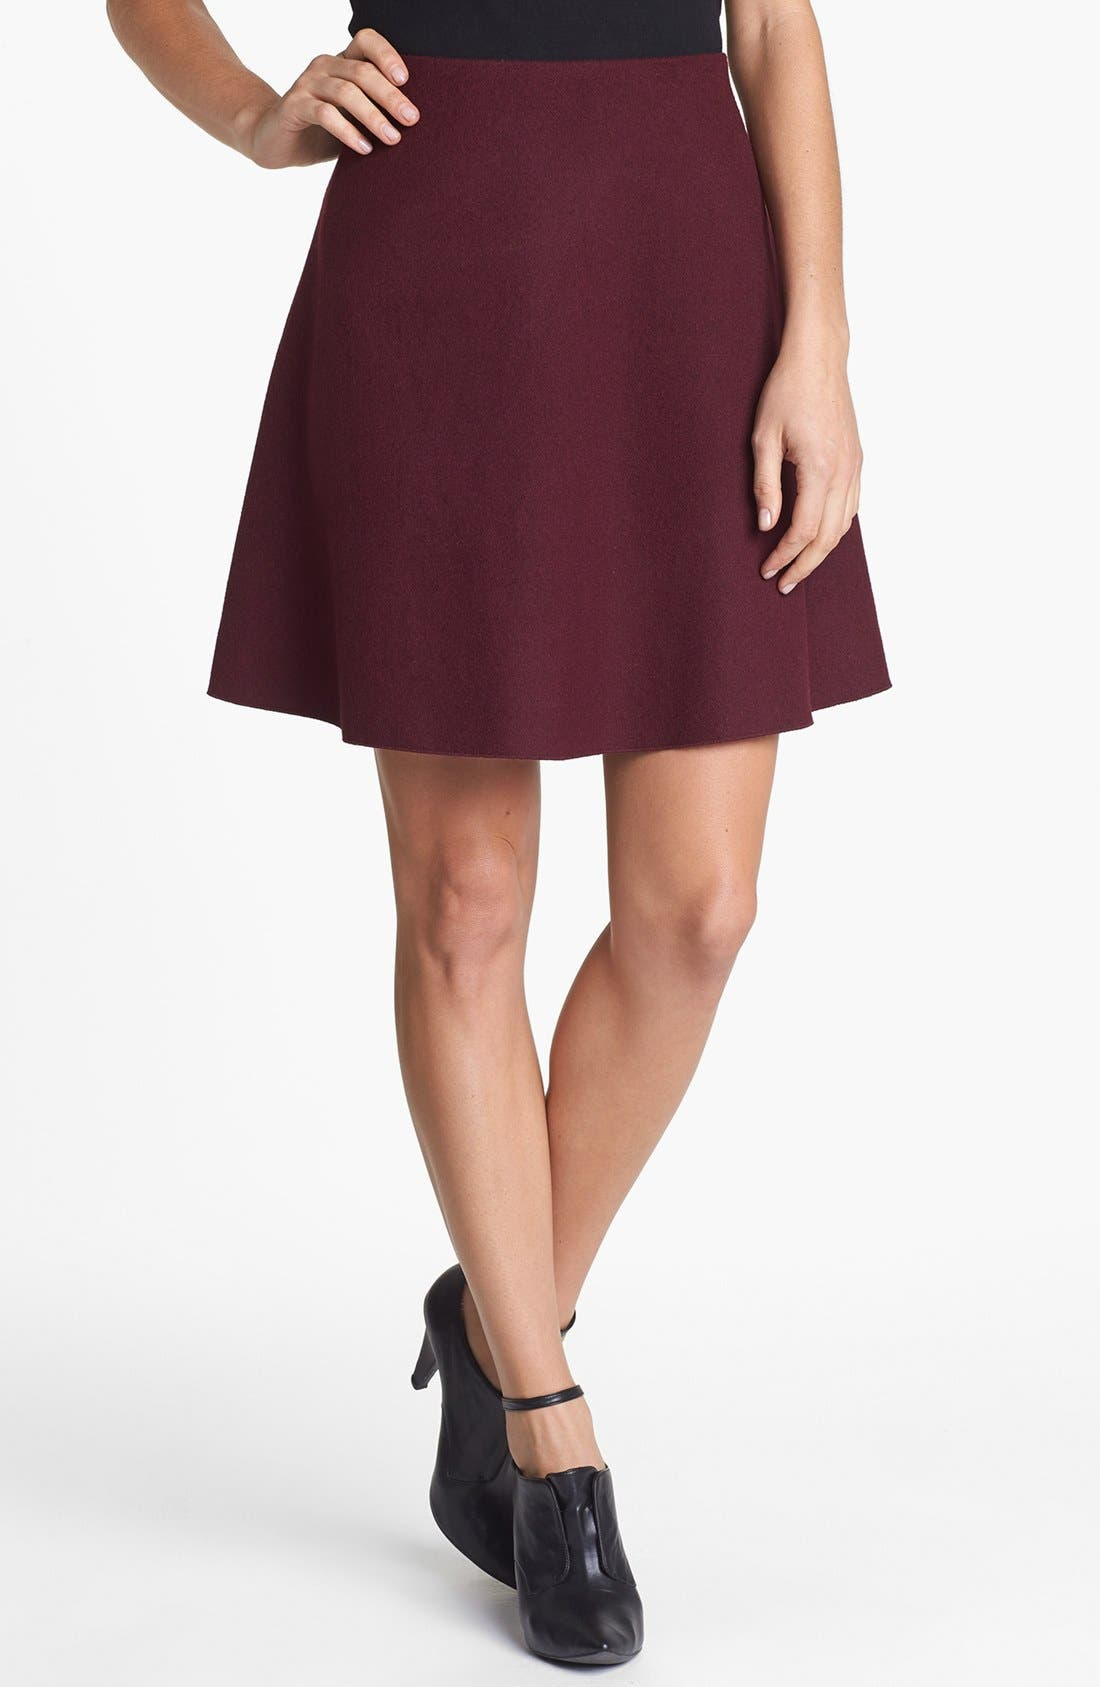 Main Image - Kenneth Cole New York 'Catarina' Skirt